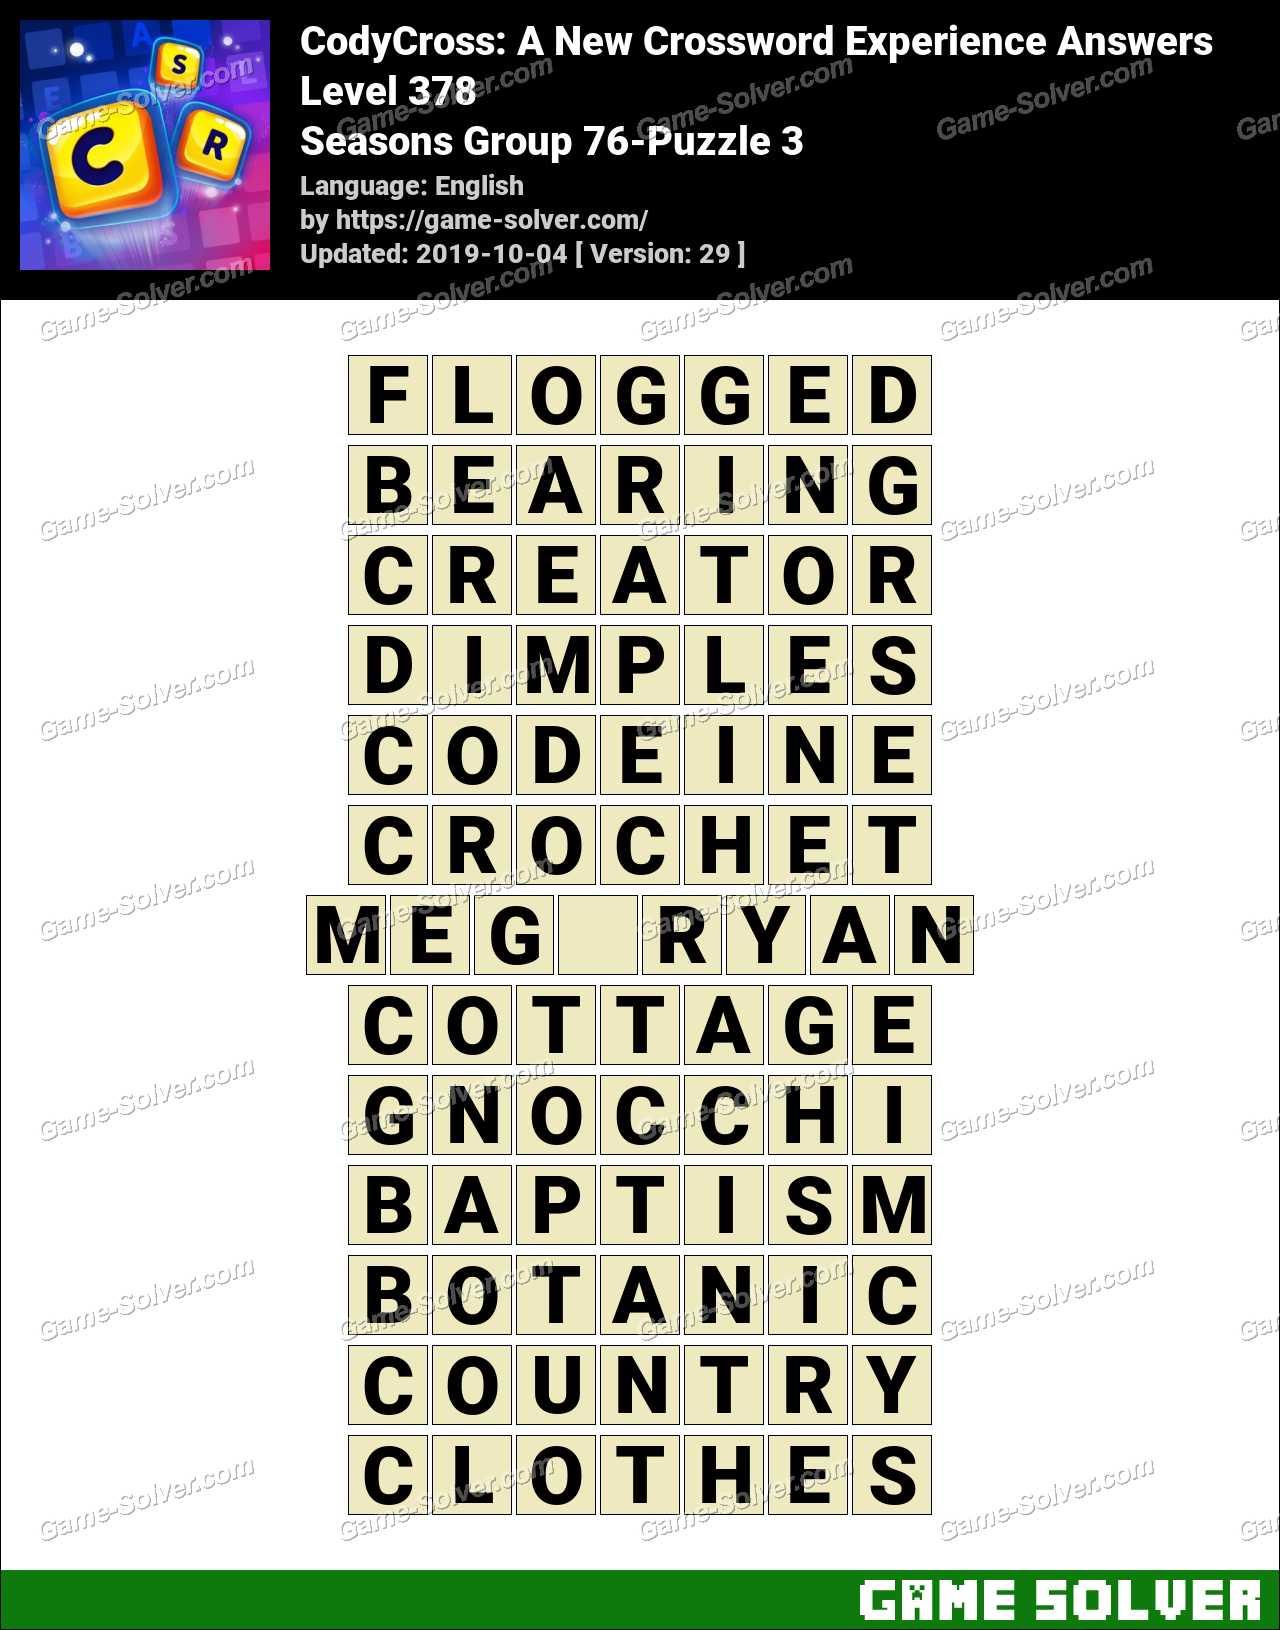 CodyCross Seasons Group 76-Puzzle 3 Answers